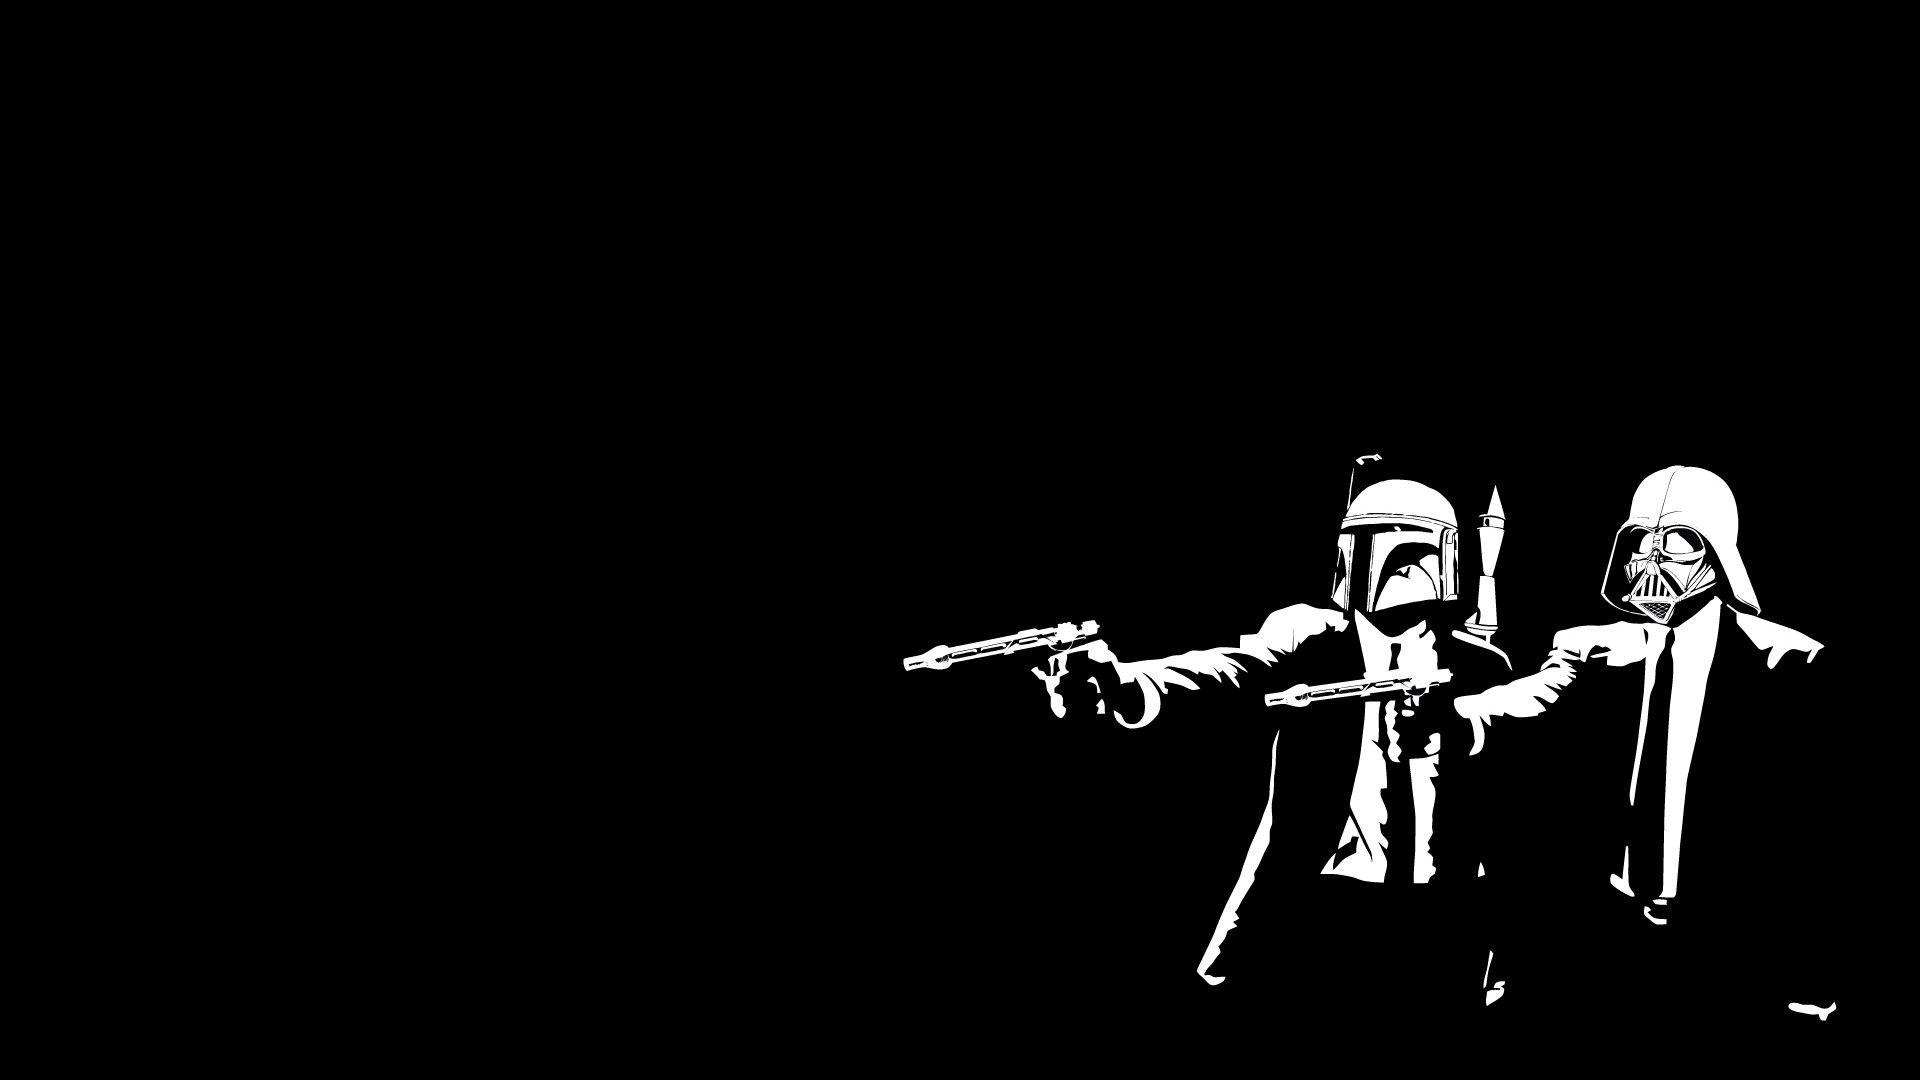 Star Wars Pulp Fiction Crossover Wallpaper Star Wars Images